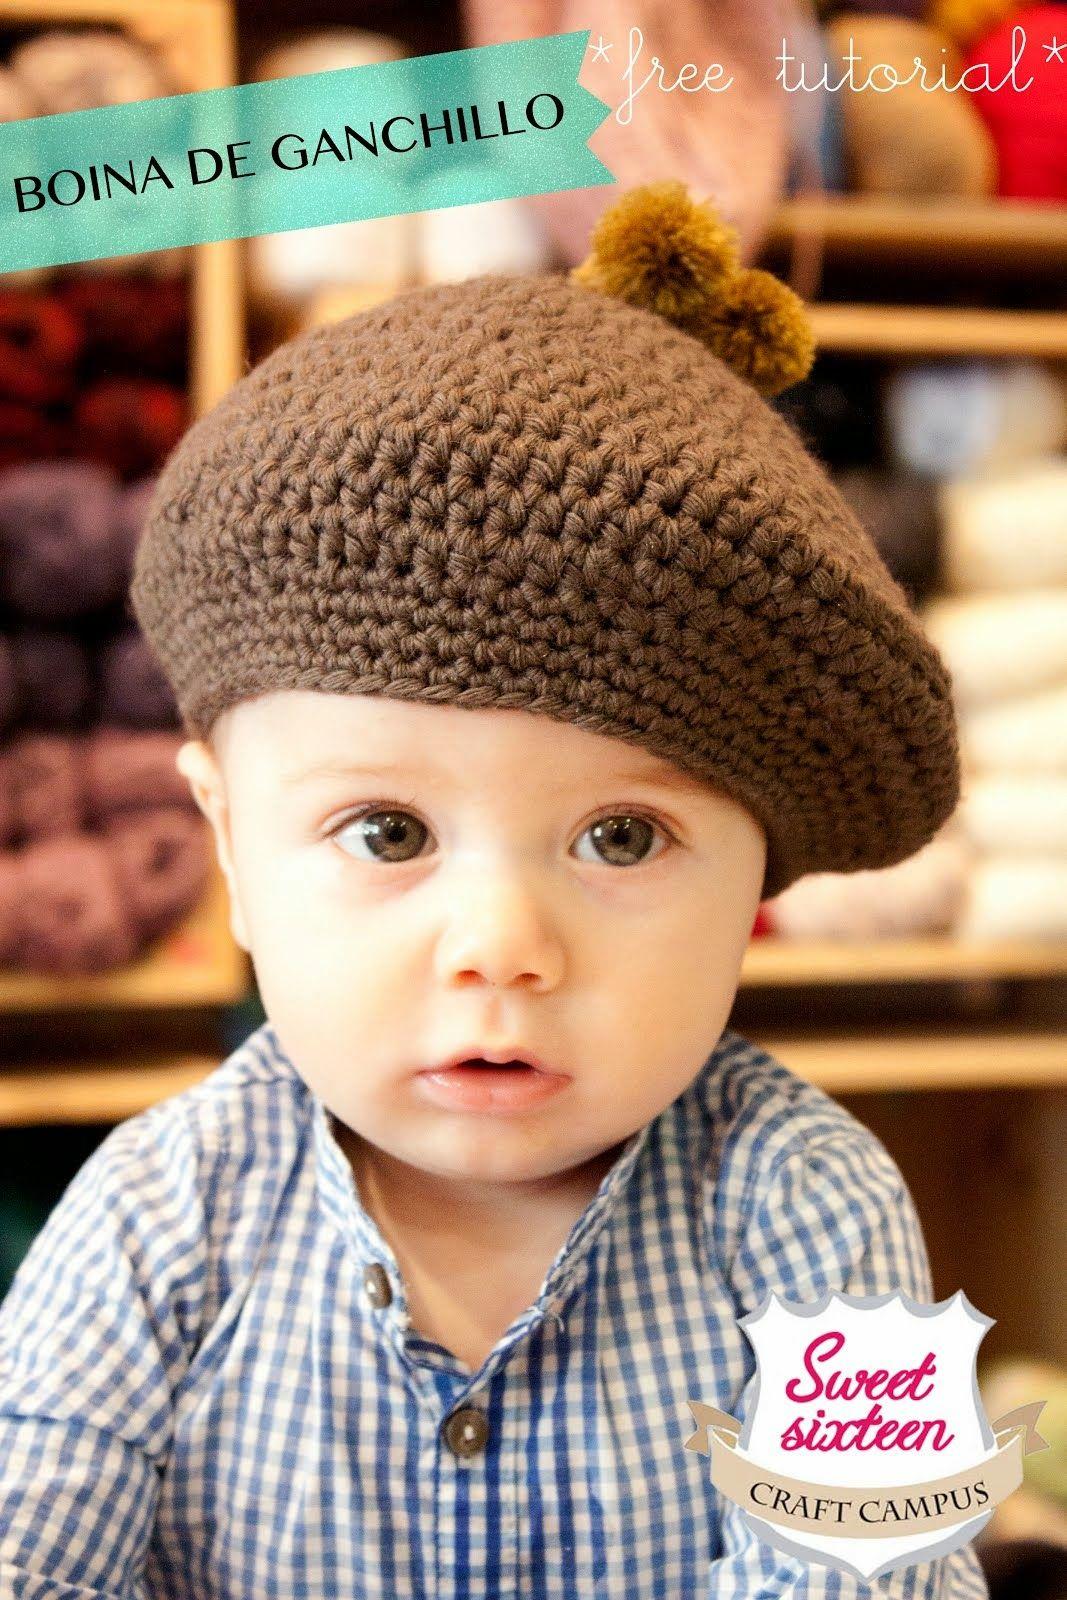 FREE TUTORIAL BOINA GANCHILLO BEBE | Crochet | Pinterest | Ganchillo ...